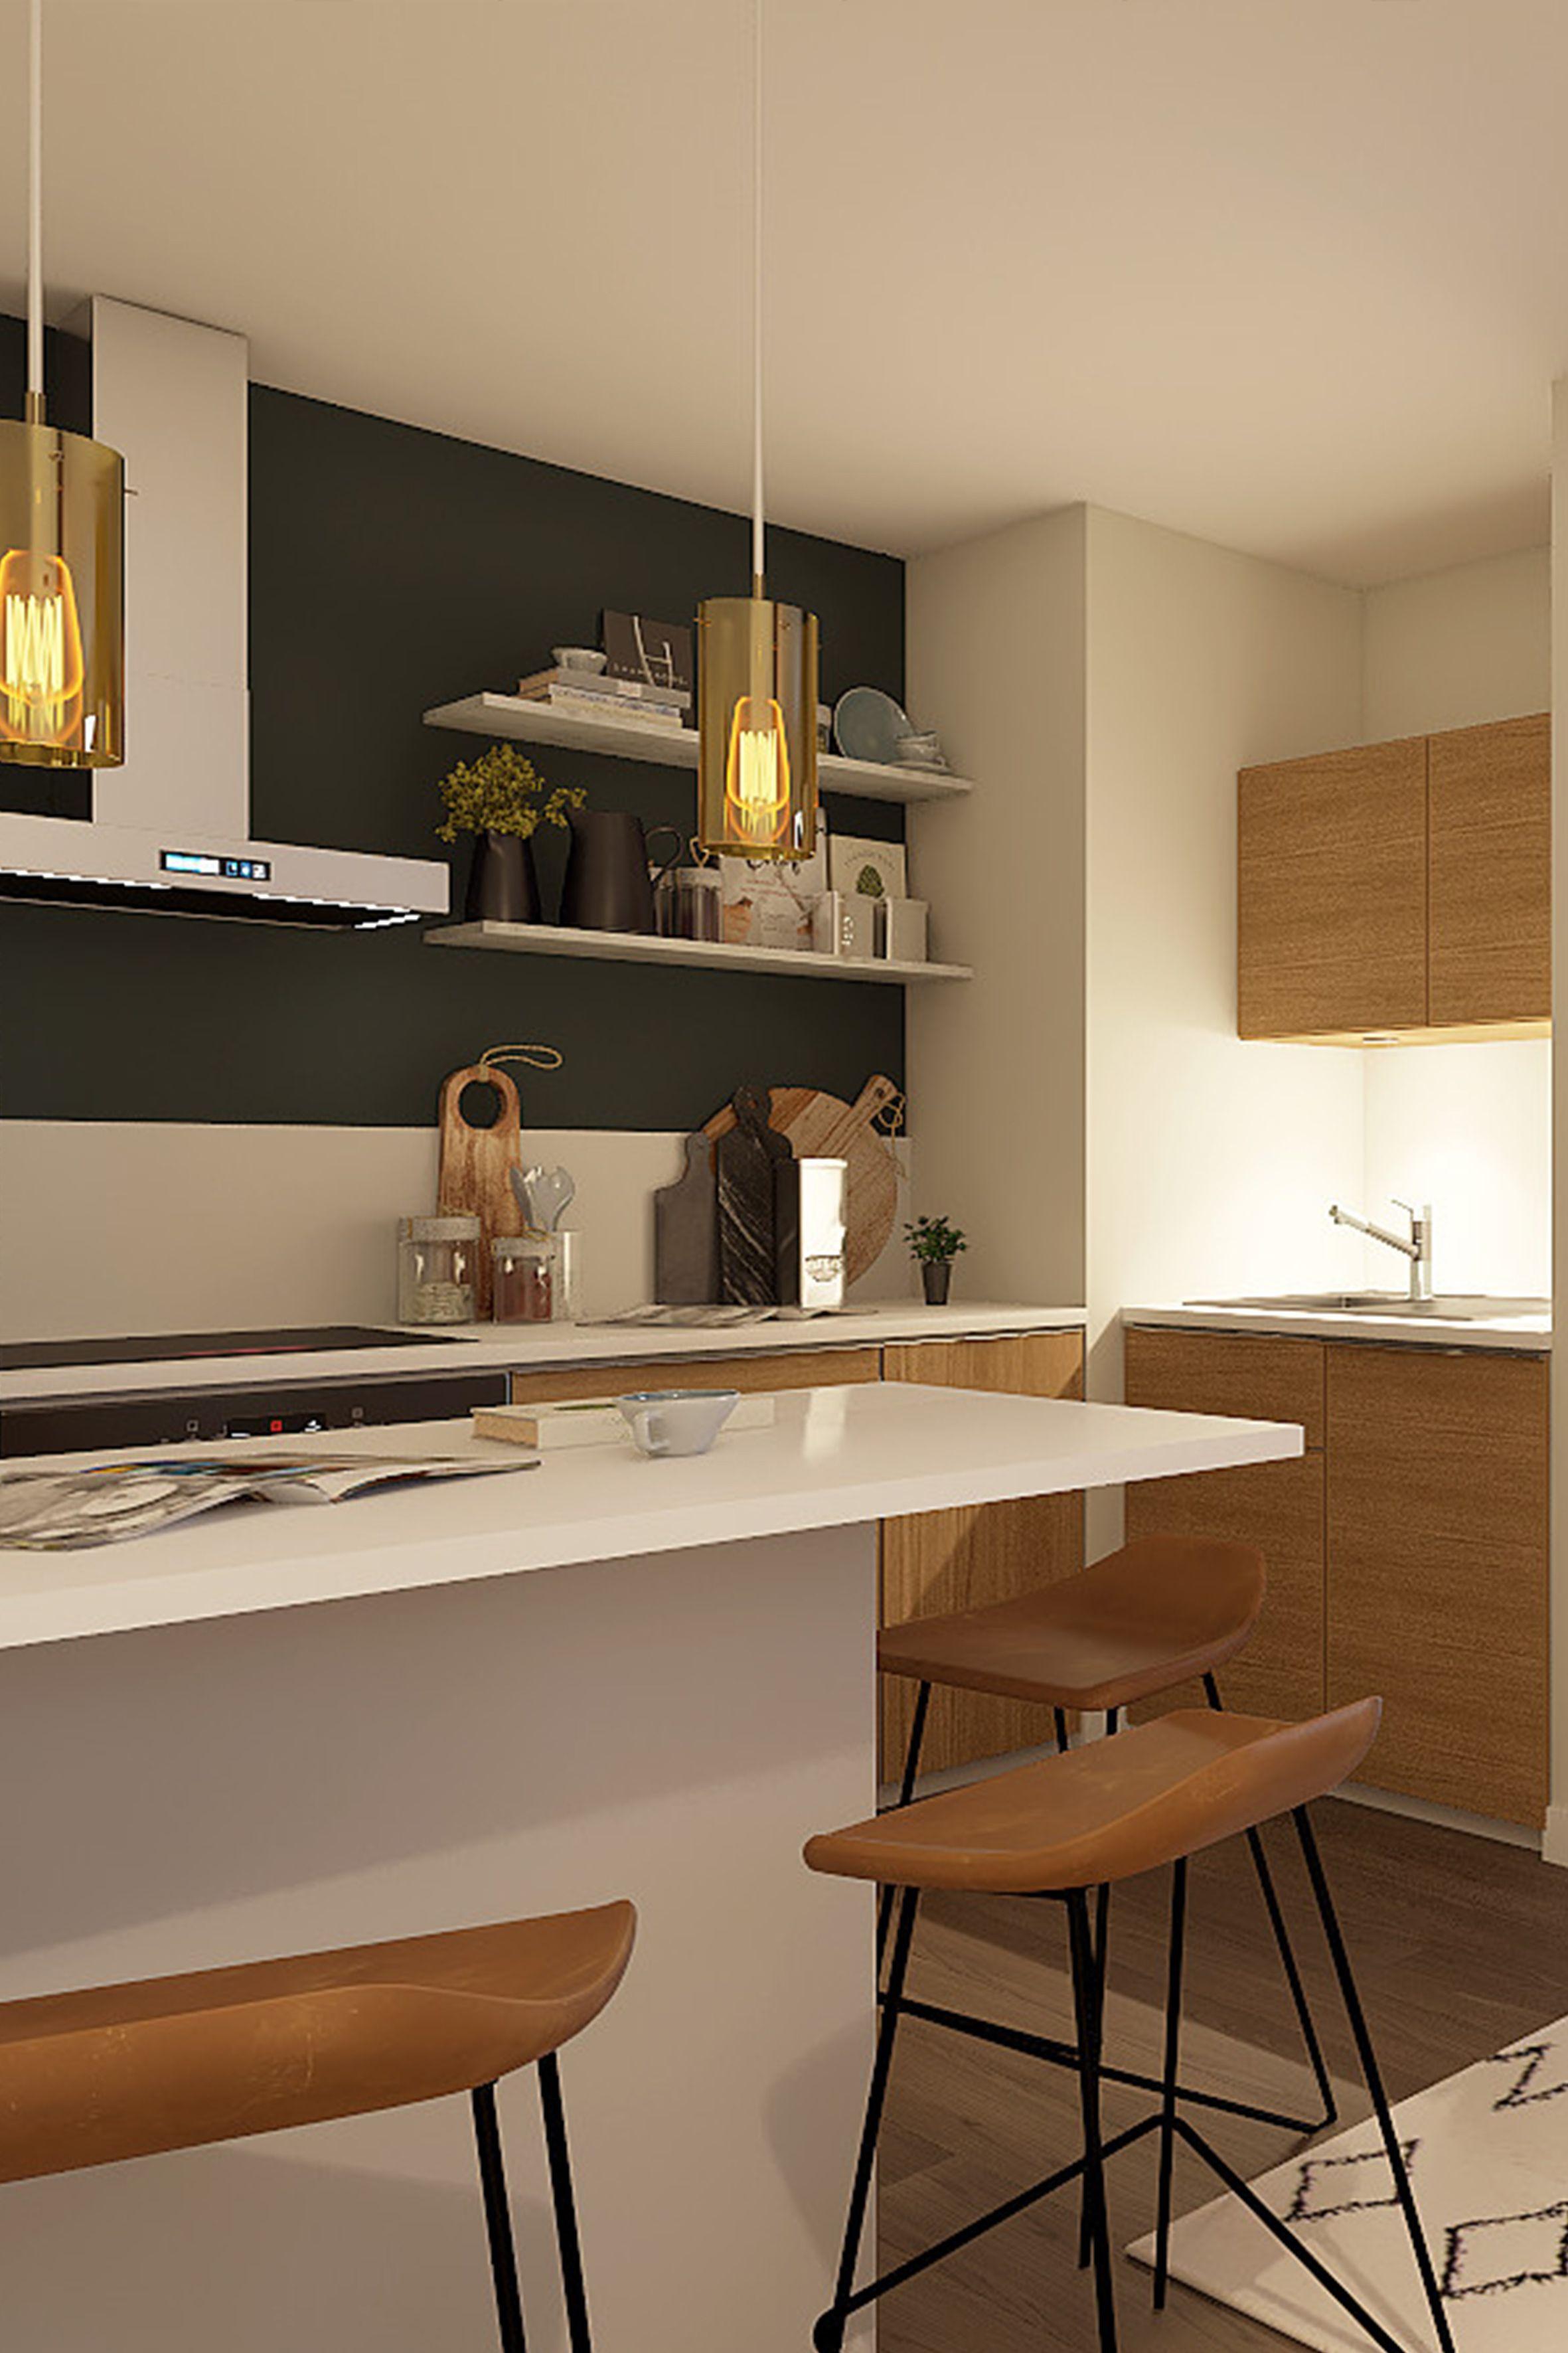 100 Génial Suggestions Decoration Cuisine Appartement Neuf